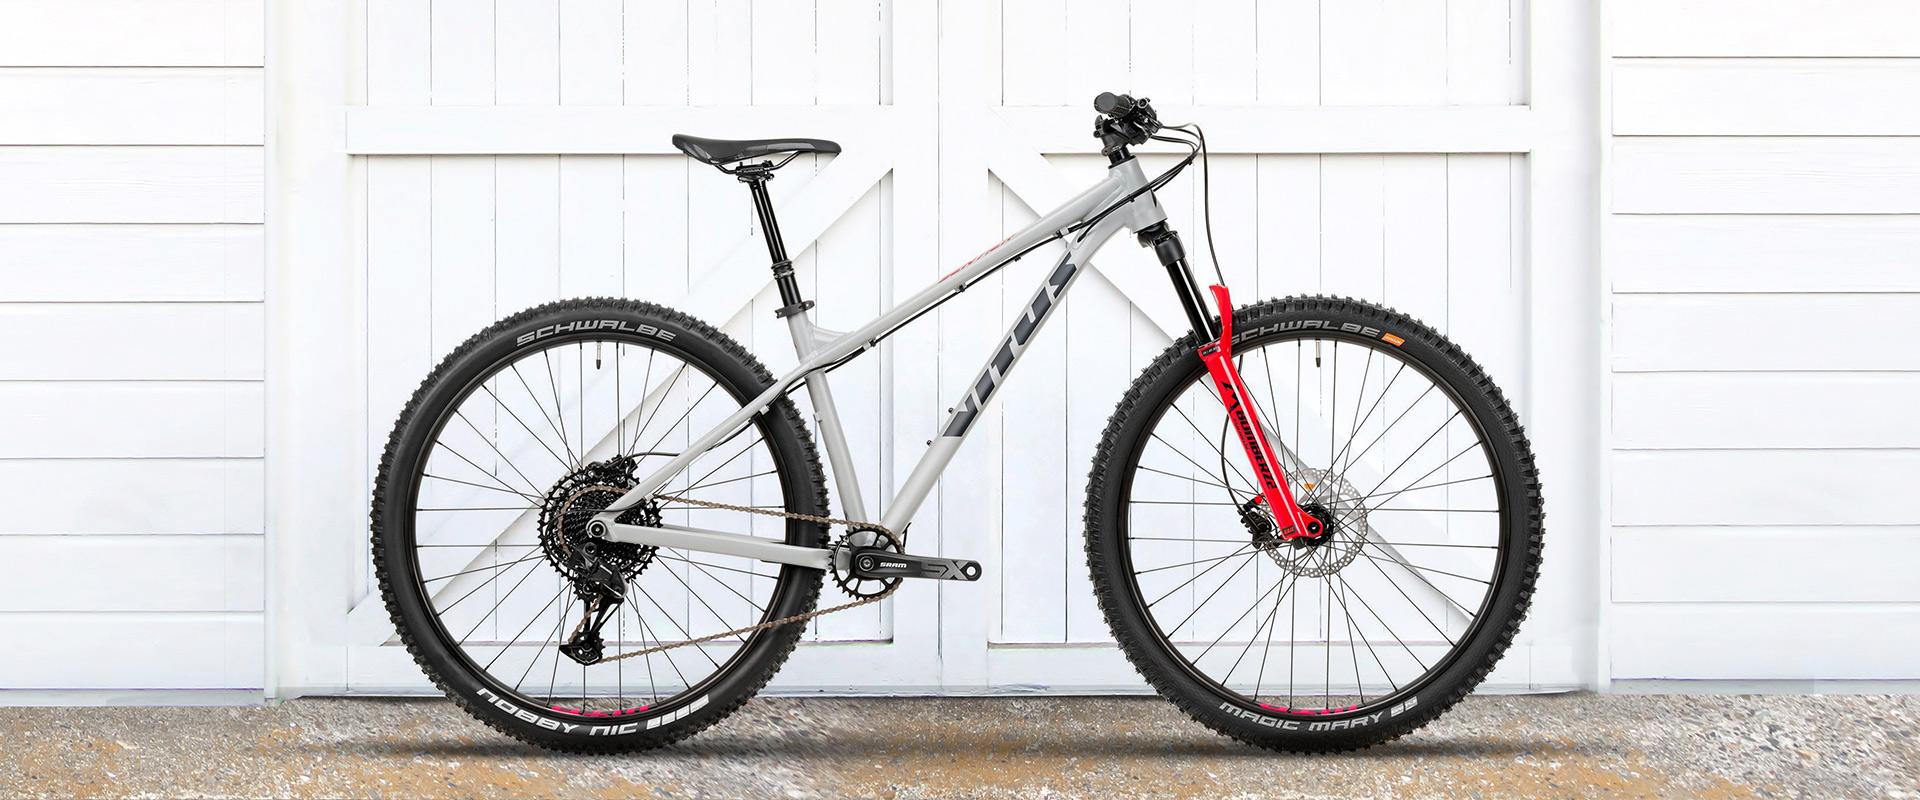 Sentier 29 VR Bike SX Eagle 1x12